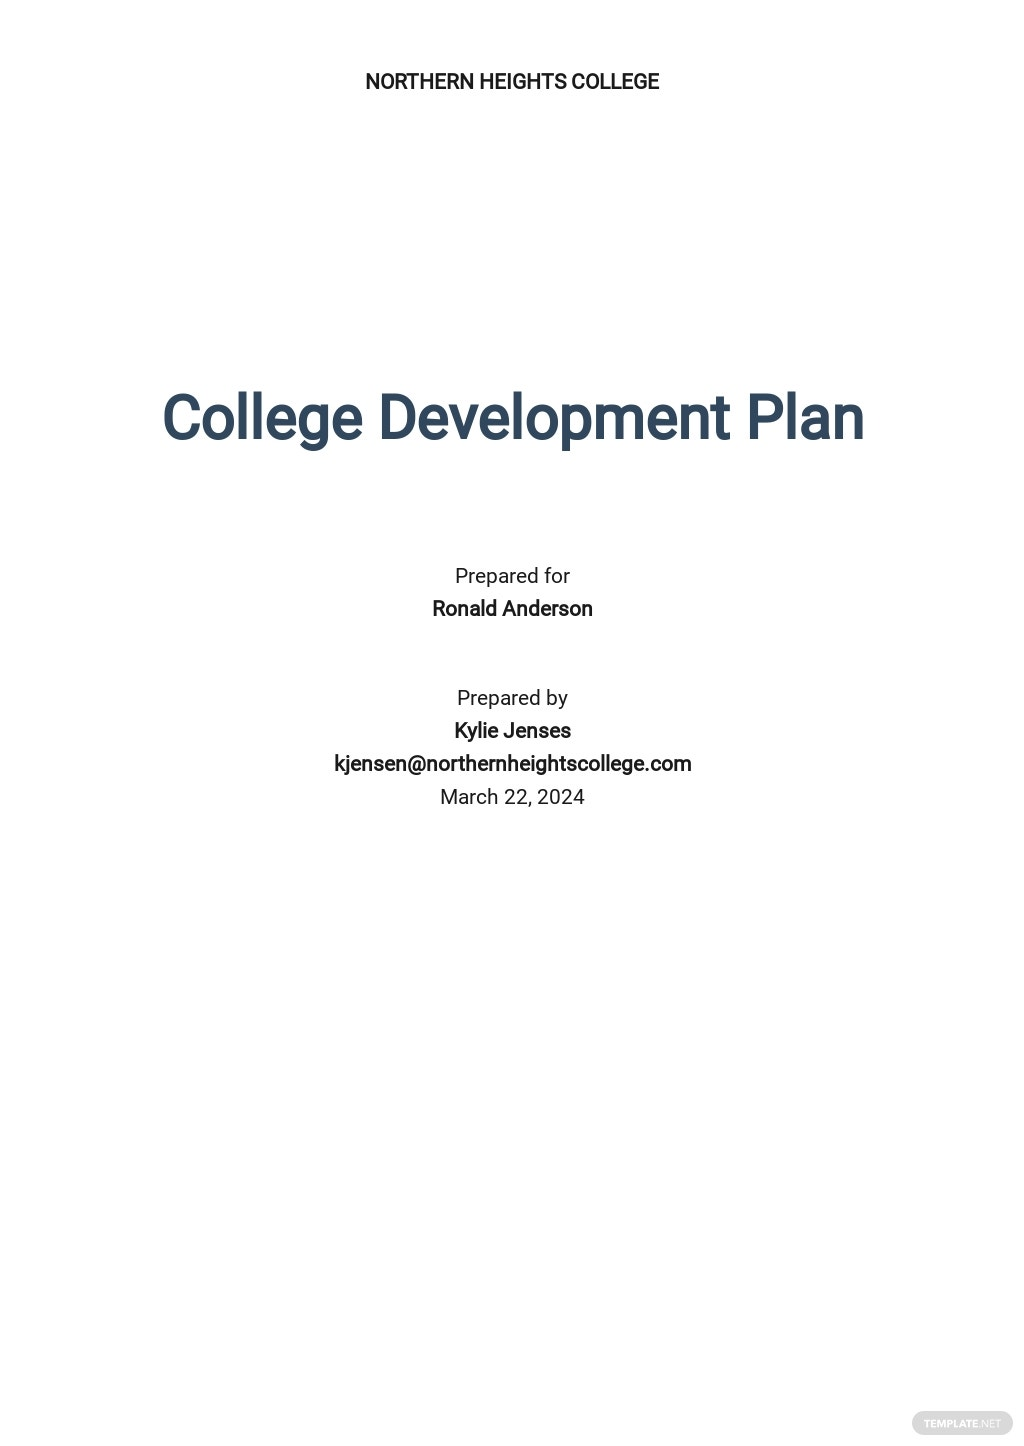 College Development Plan Template.jpe